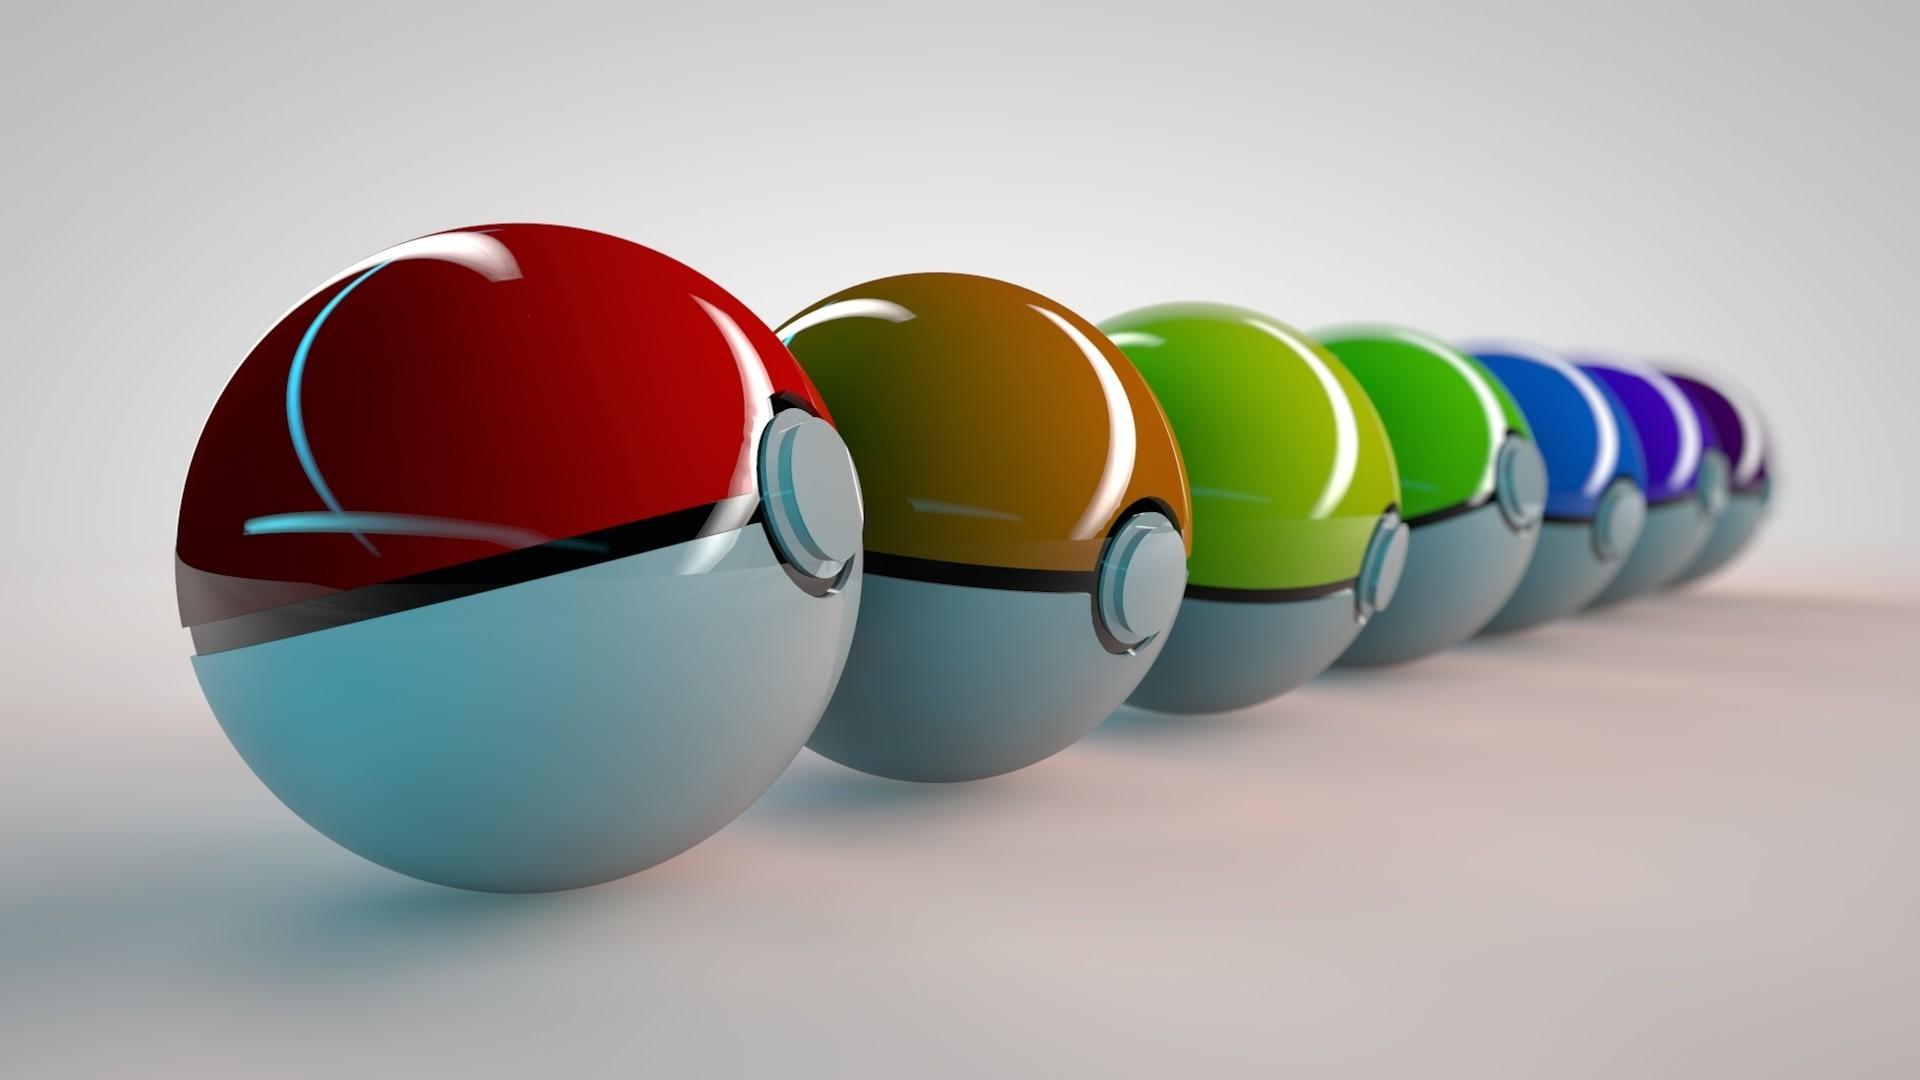 Pokemon Ball Pokeball Wallpapers